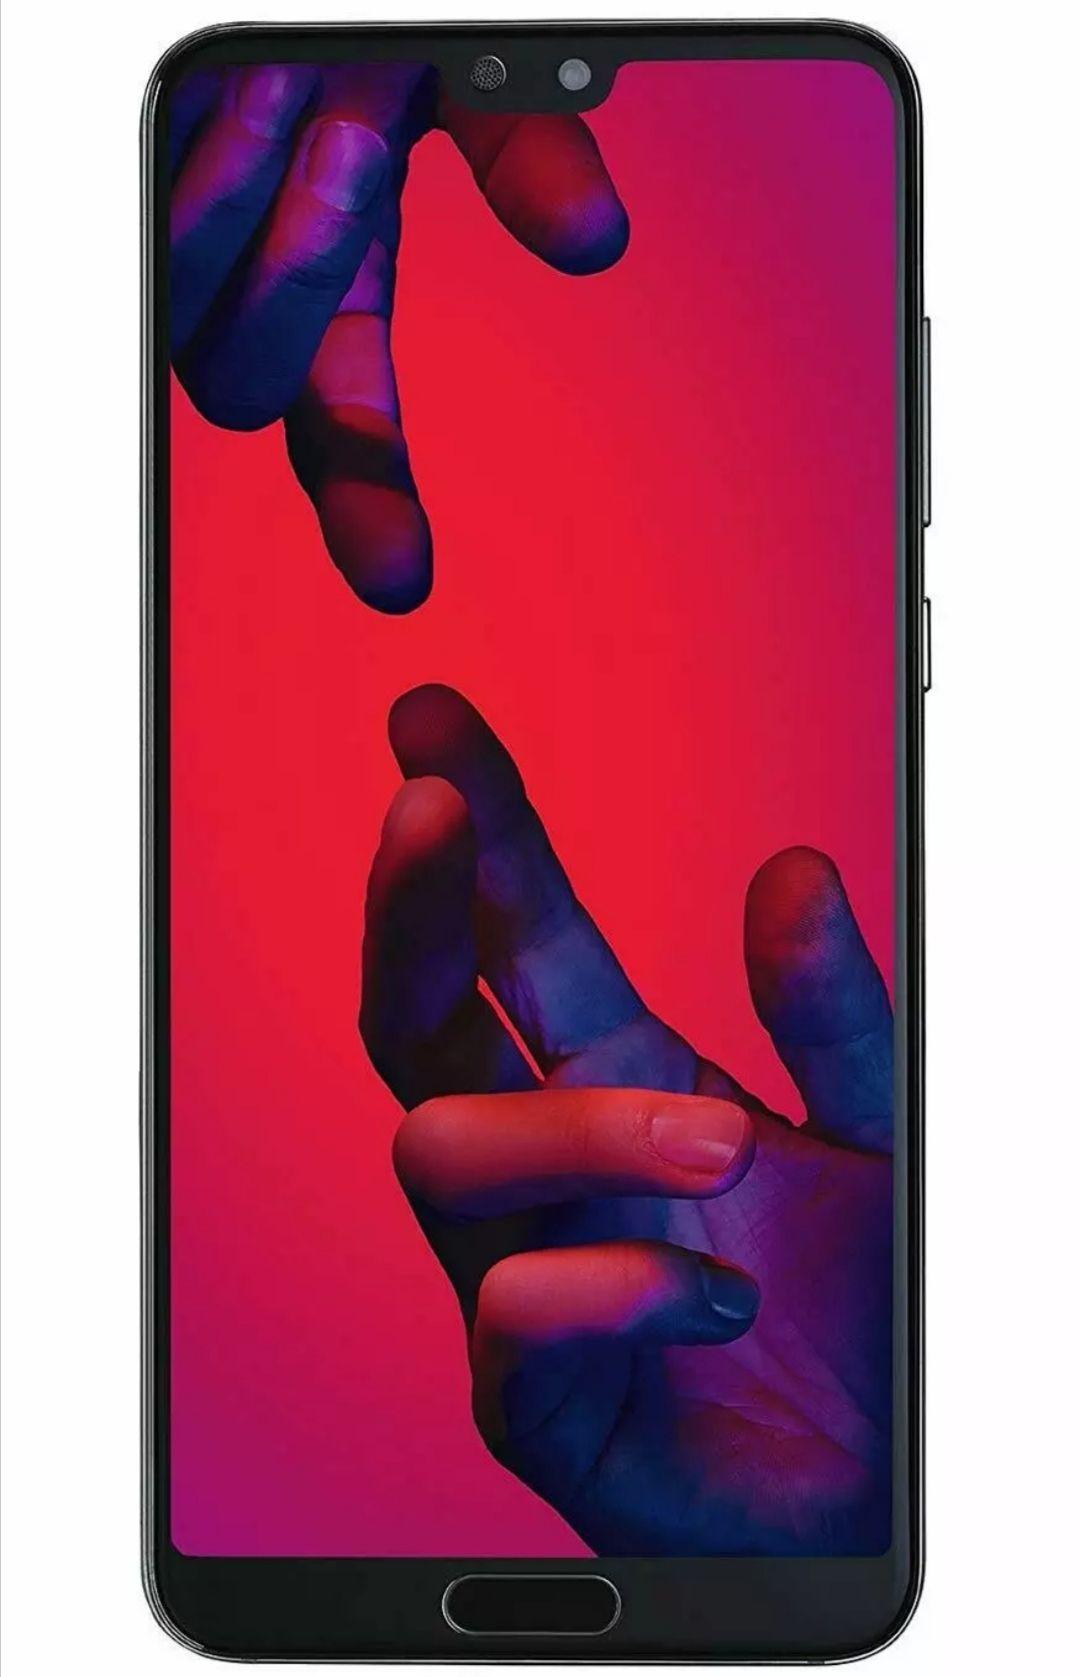 refurbished Huawei P20 Pro 128GB Good £163.99 | Very Good £175.99 @ My whit Ebay